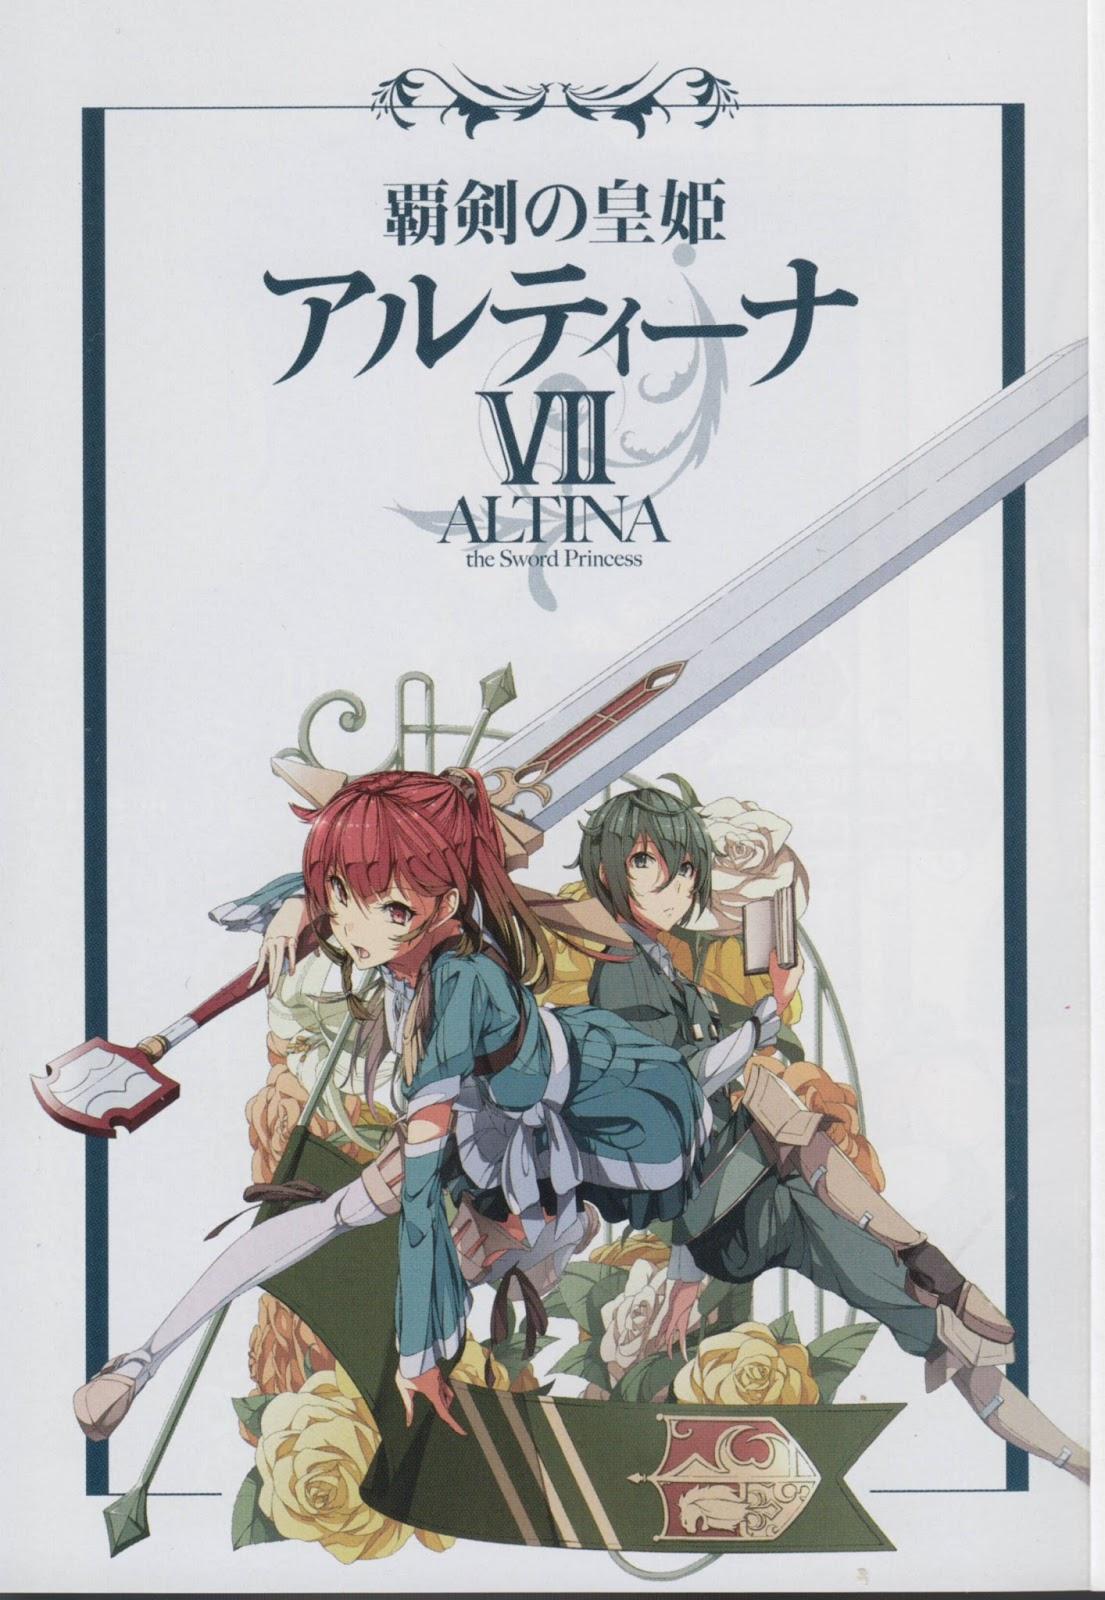 altina the sword princess pdf